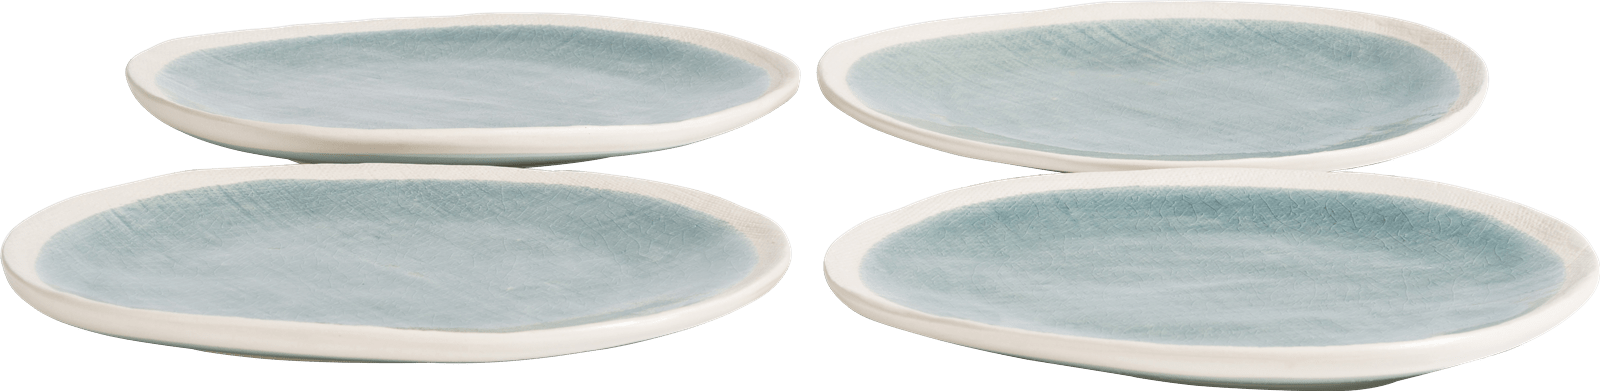 Happy@Home - Coco Maison - amalfi set van 4 borden d27cm